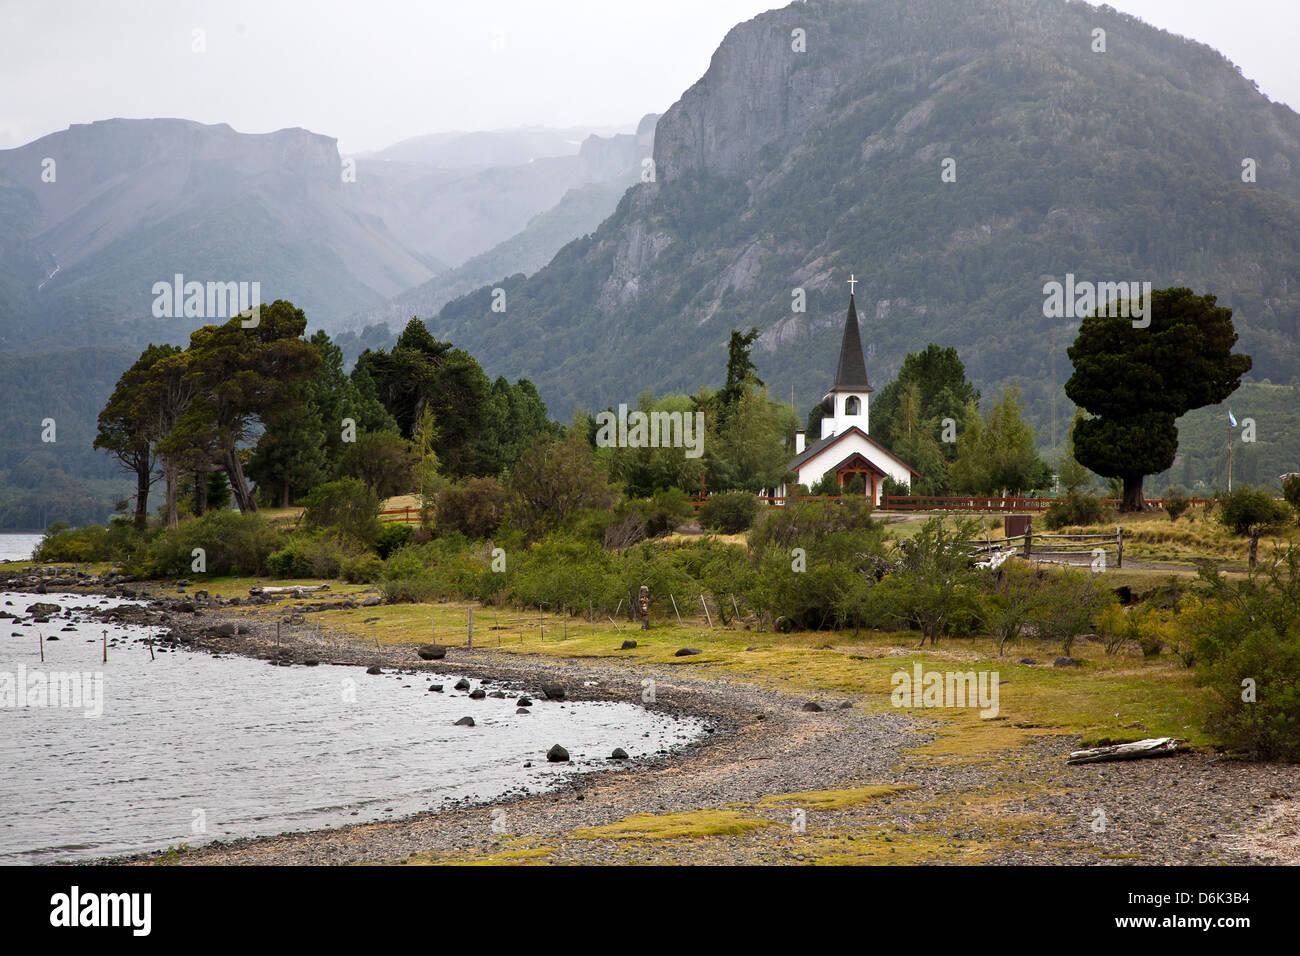 Paisaje en Lago Paimun, Parque Nacional Lanin, Patagonia, Argentina, Sudamérica Imagen De Stock